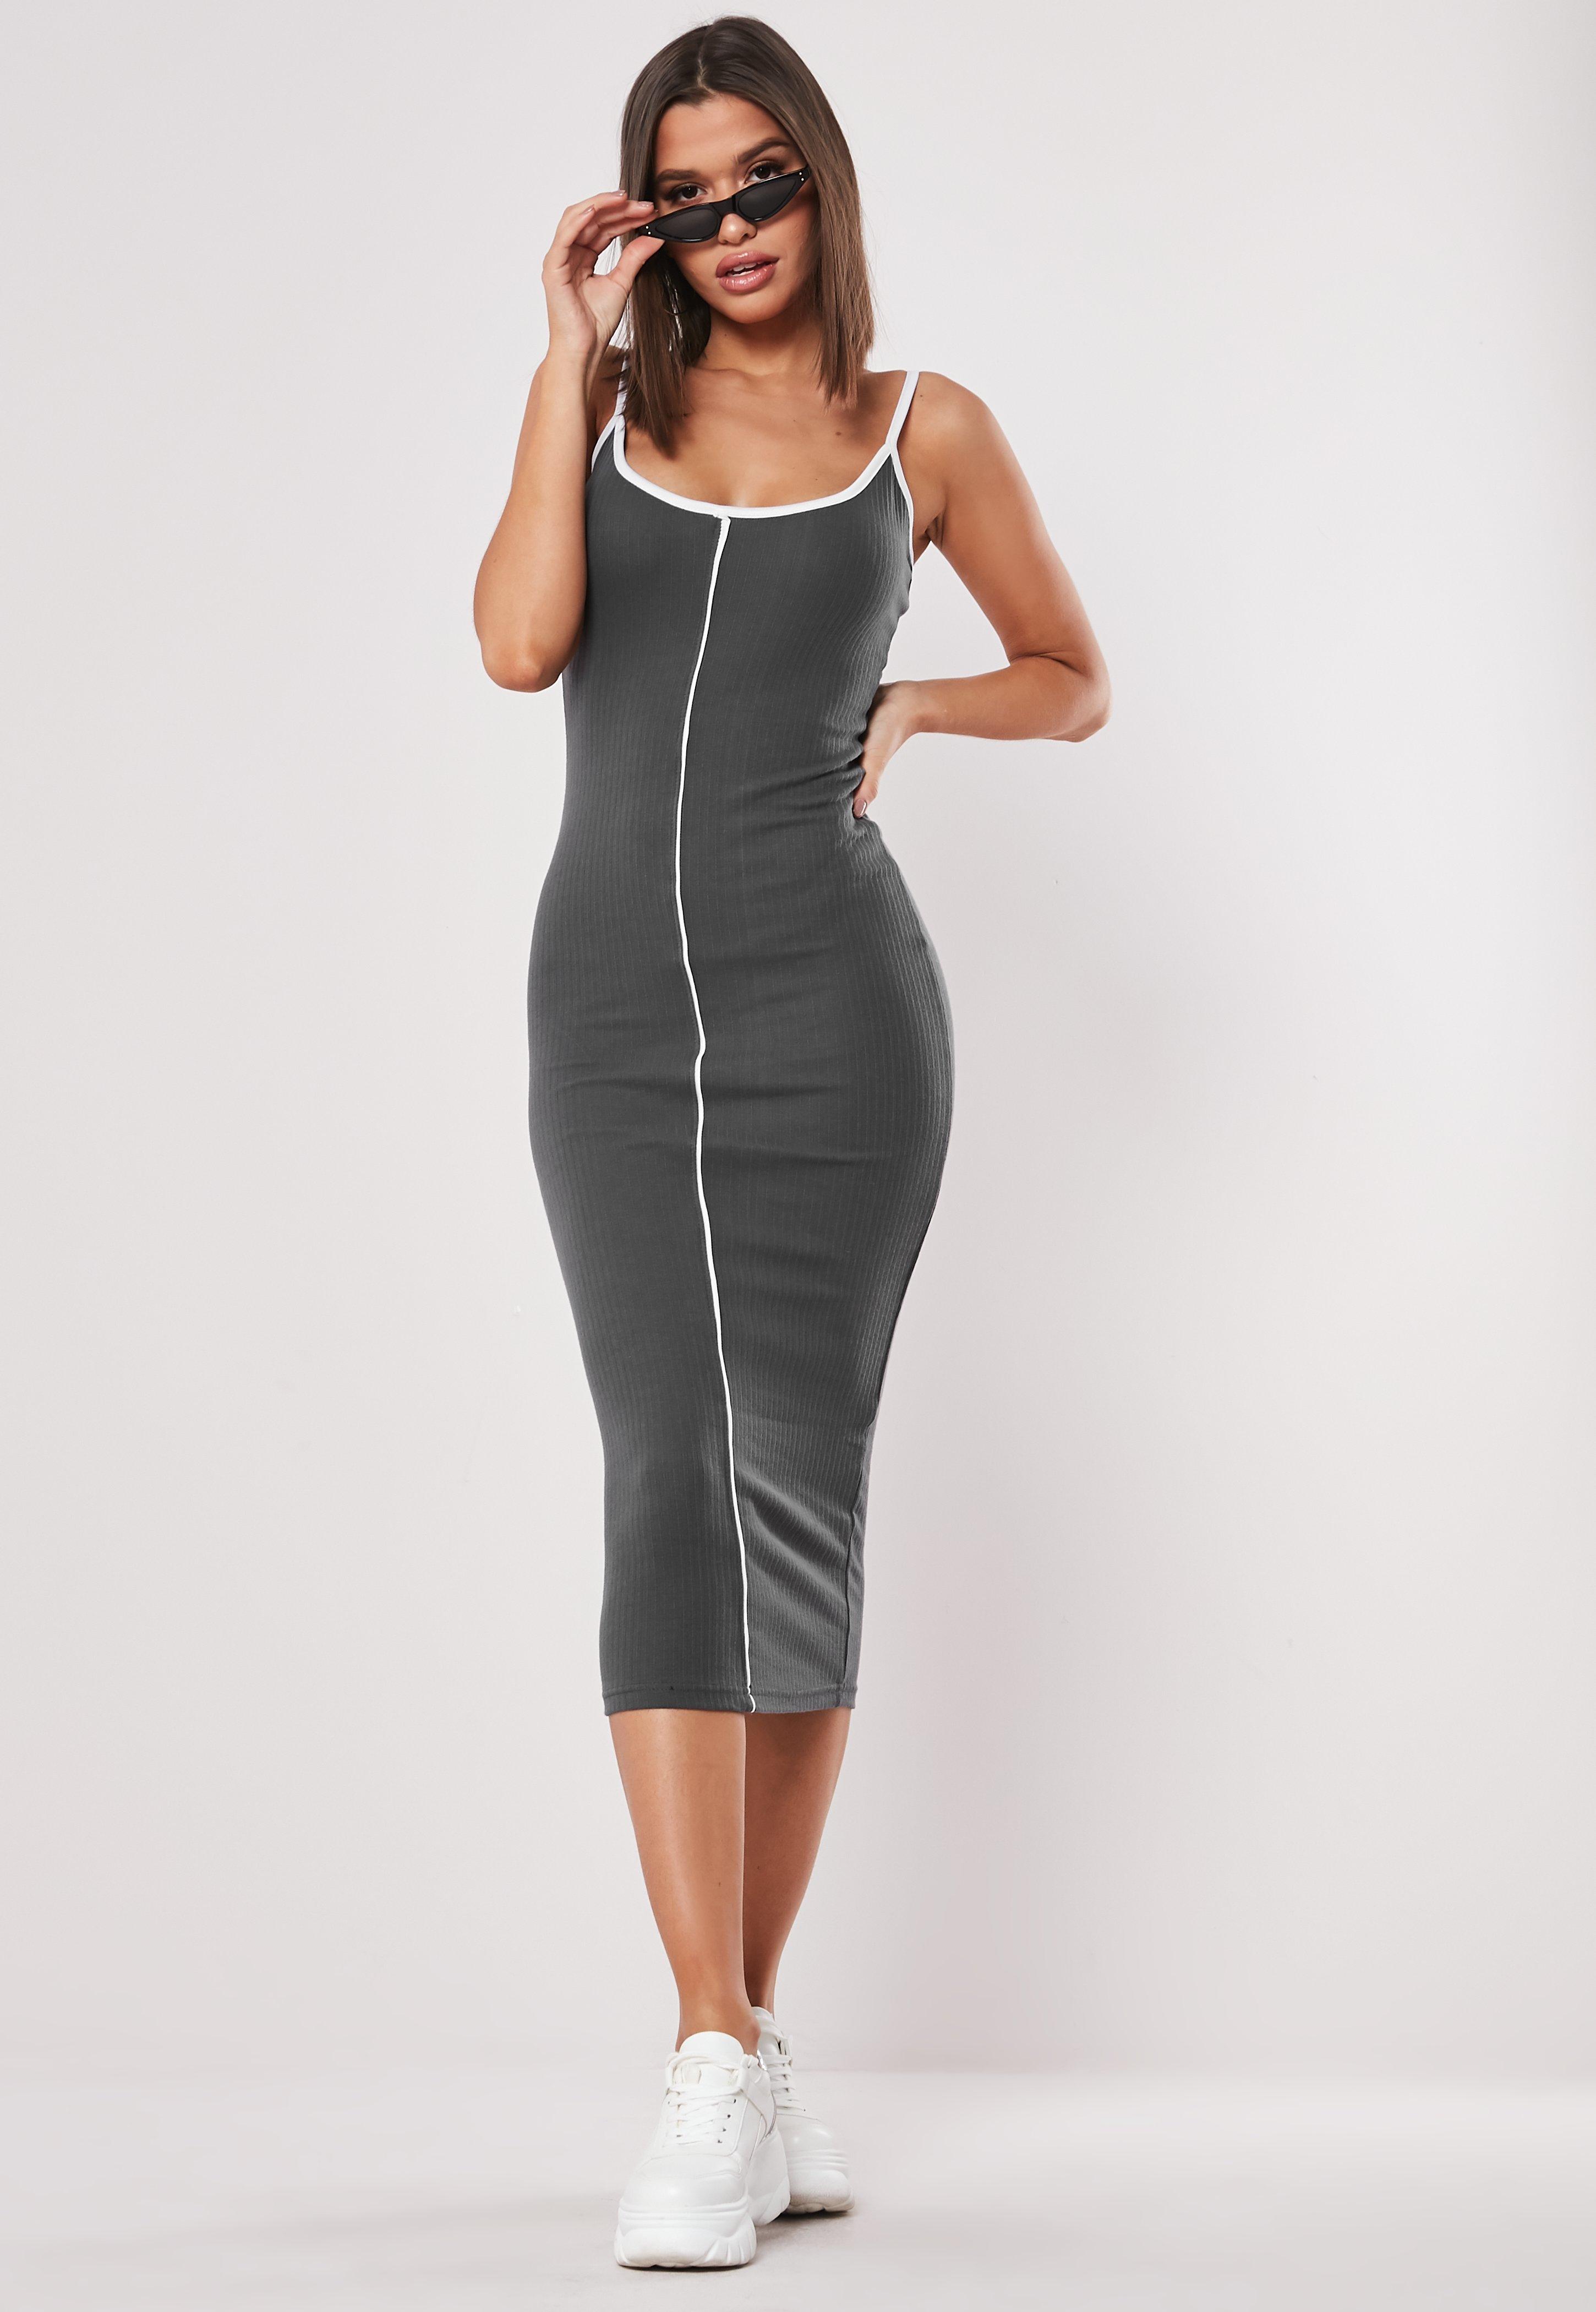 ebce0d418f62 Dresses | Women's Dresses Online - Missguided Australia